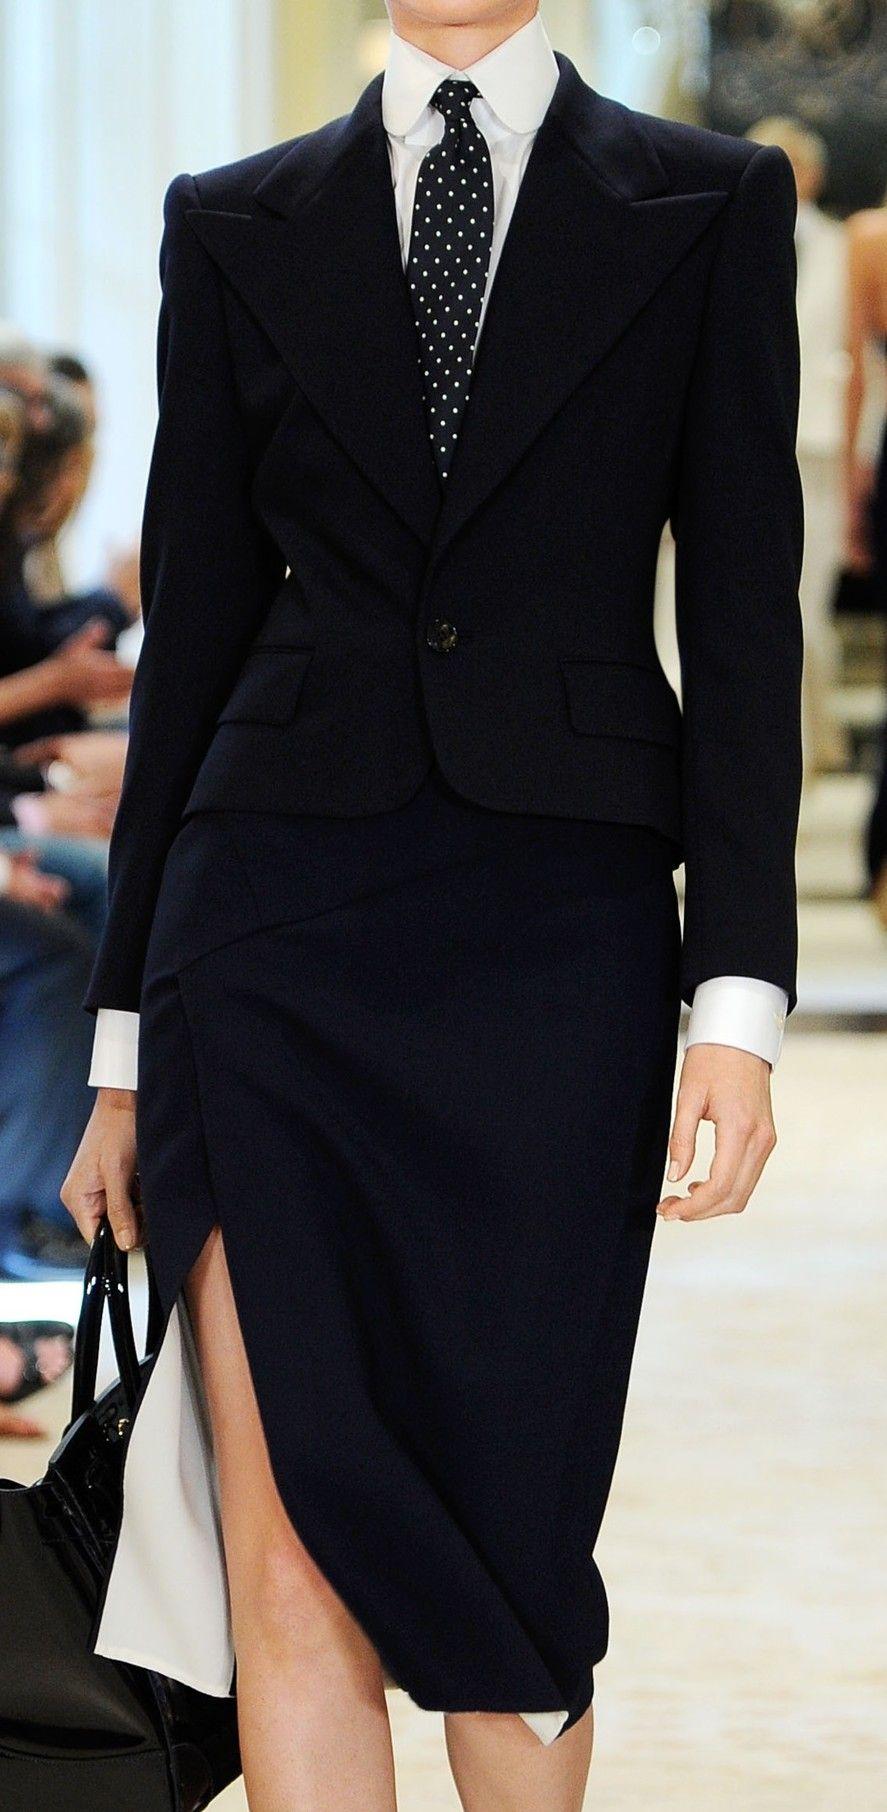 Traje corbata negra mujer